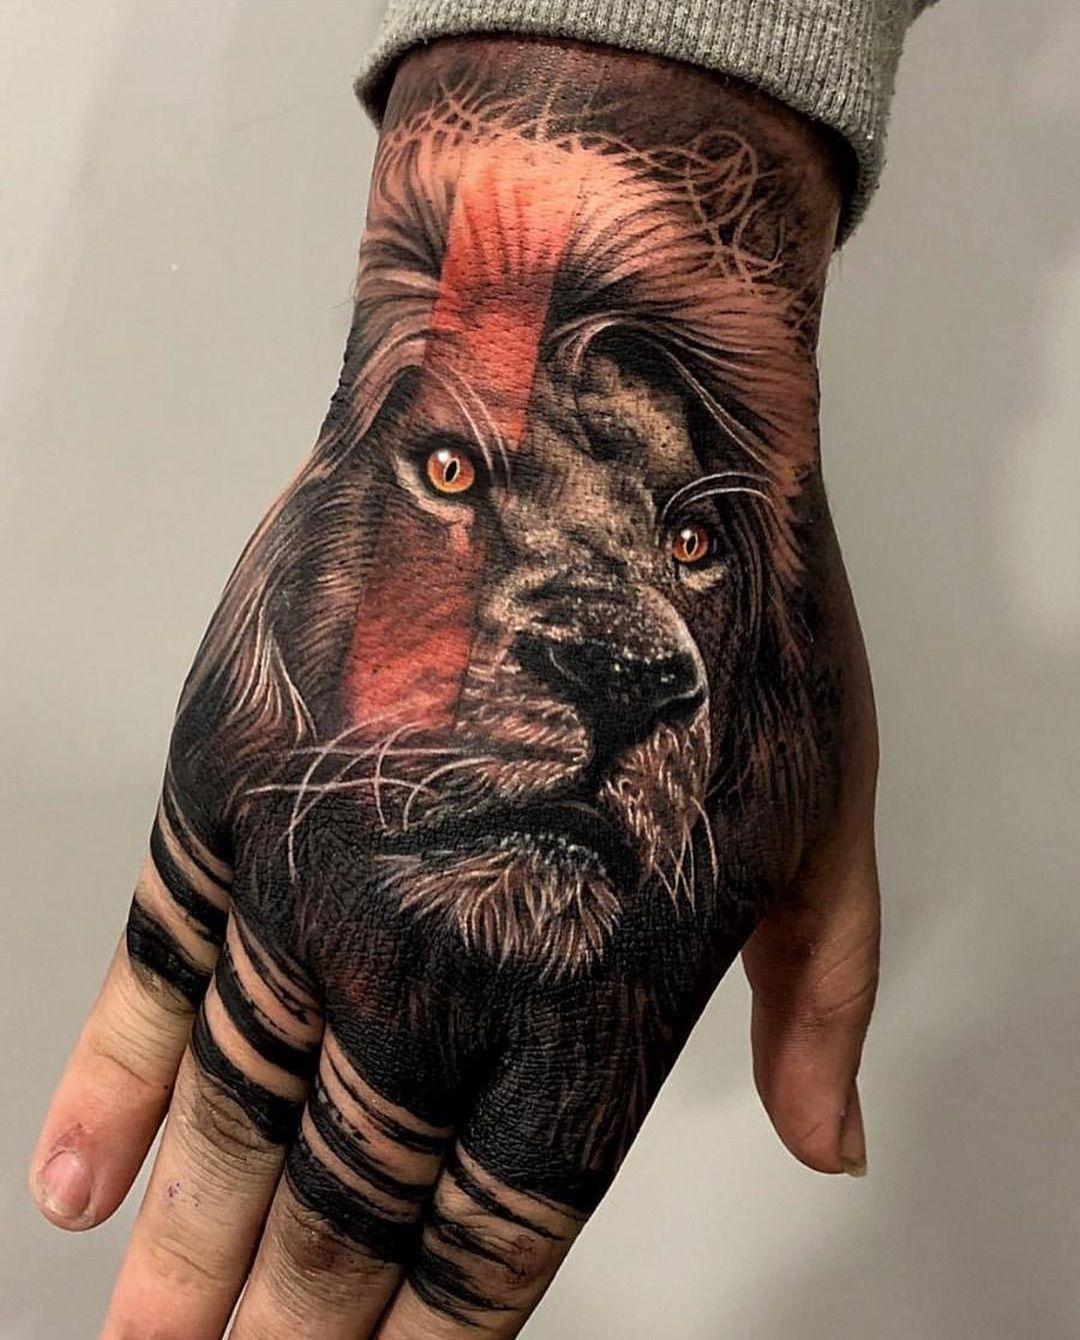 Tattoo By Edicontreras Lion Realistic Hand Tattoo Tattoo Raubk Tatuajes De Cabeza De Leon Tatuaje De Leon En La Mano Tatuajes En La Mano Para Hombres